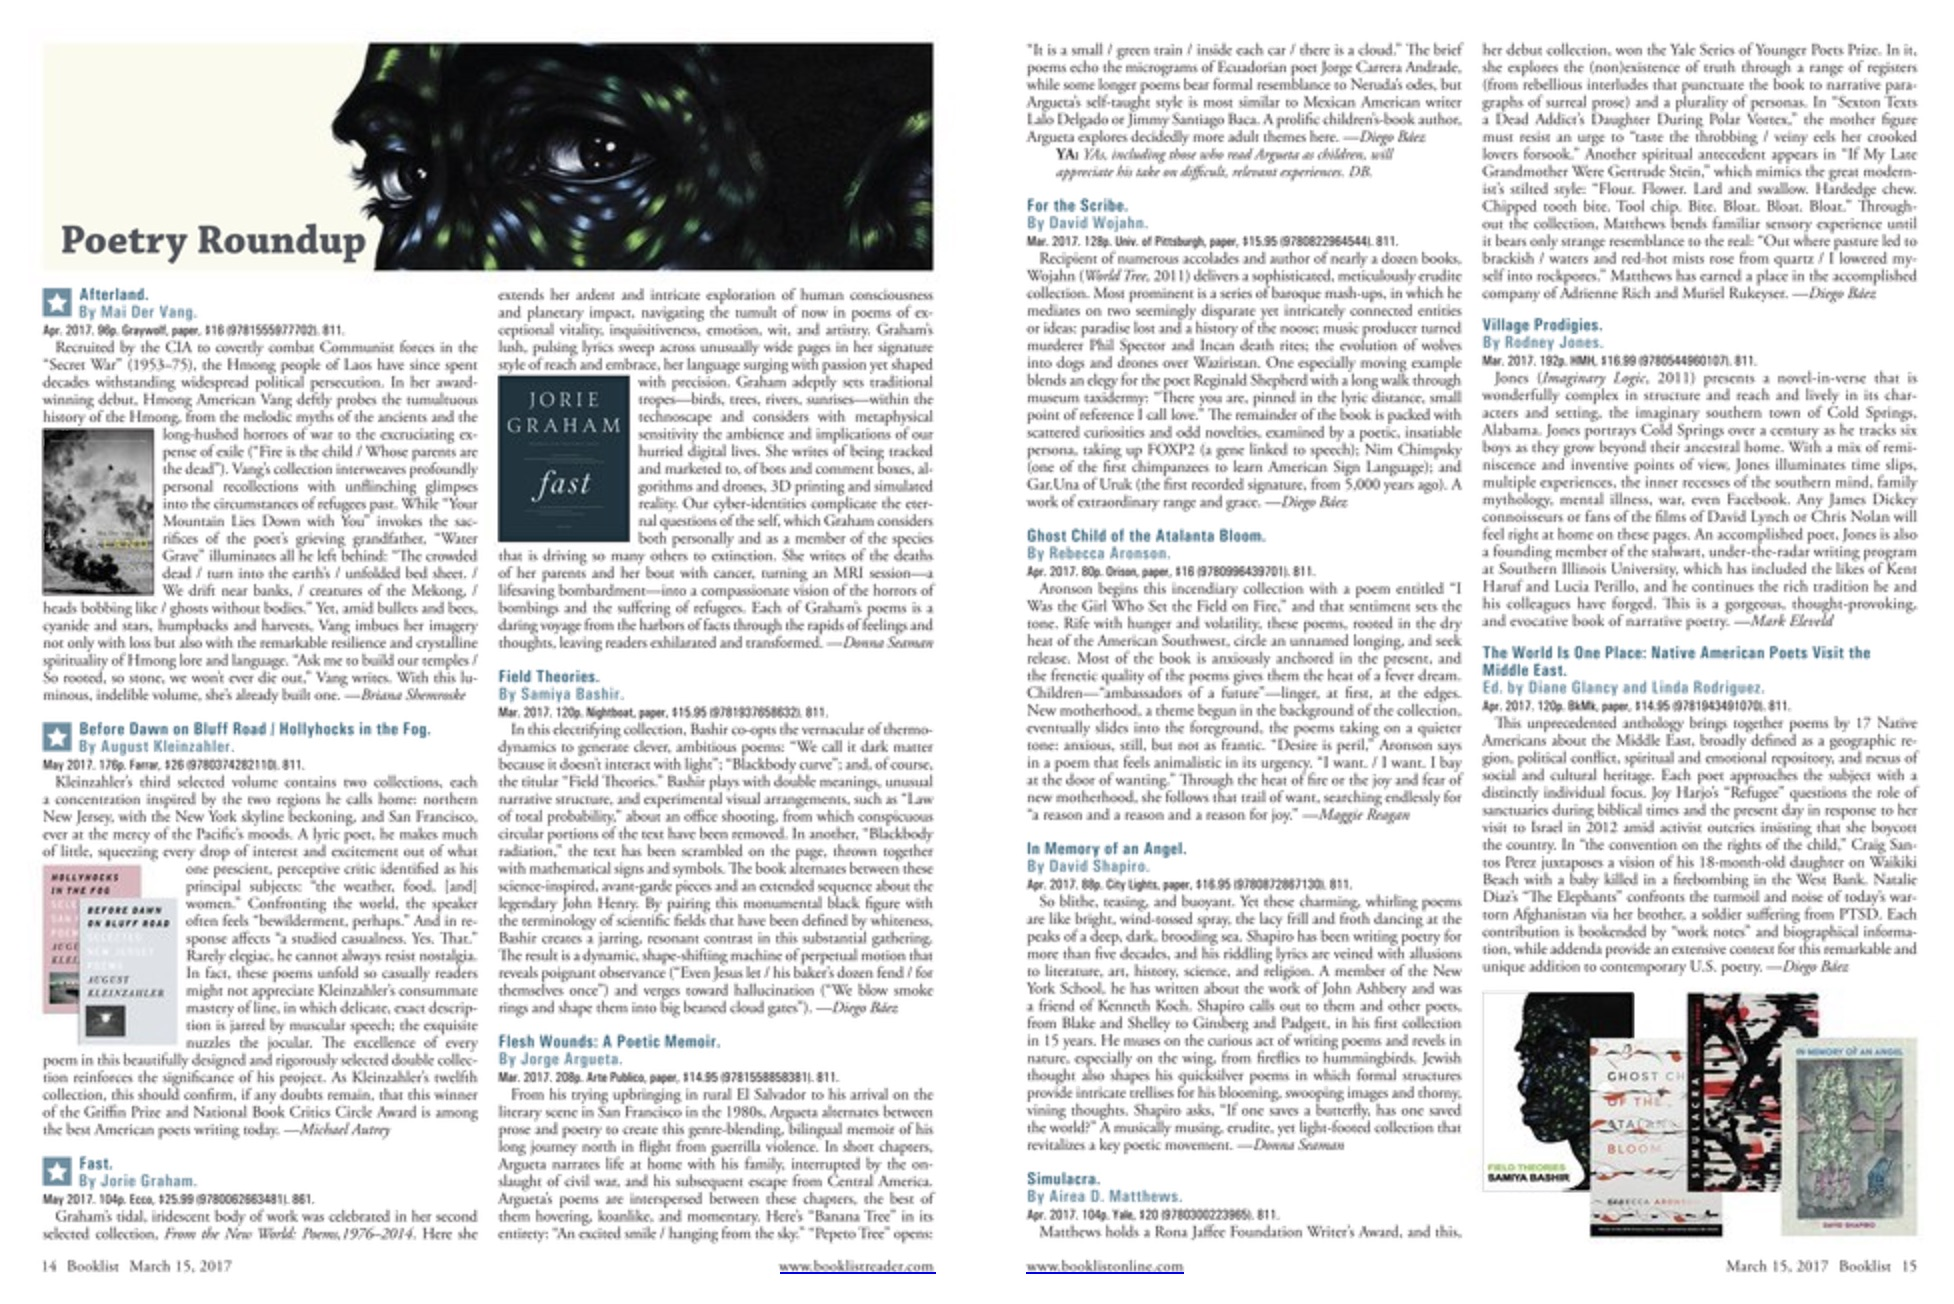 booklist_field-theories_review.jpg